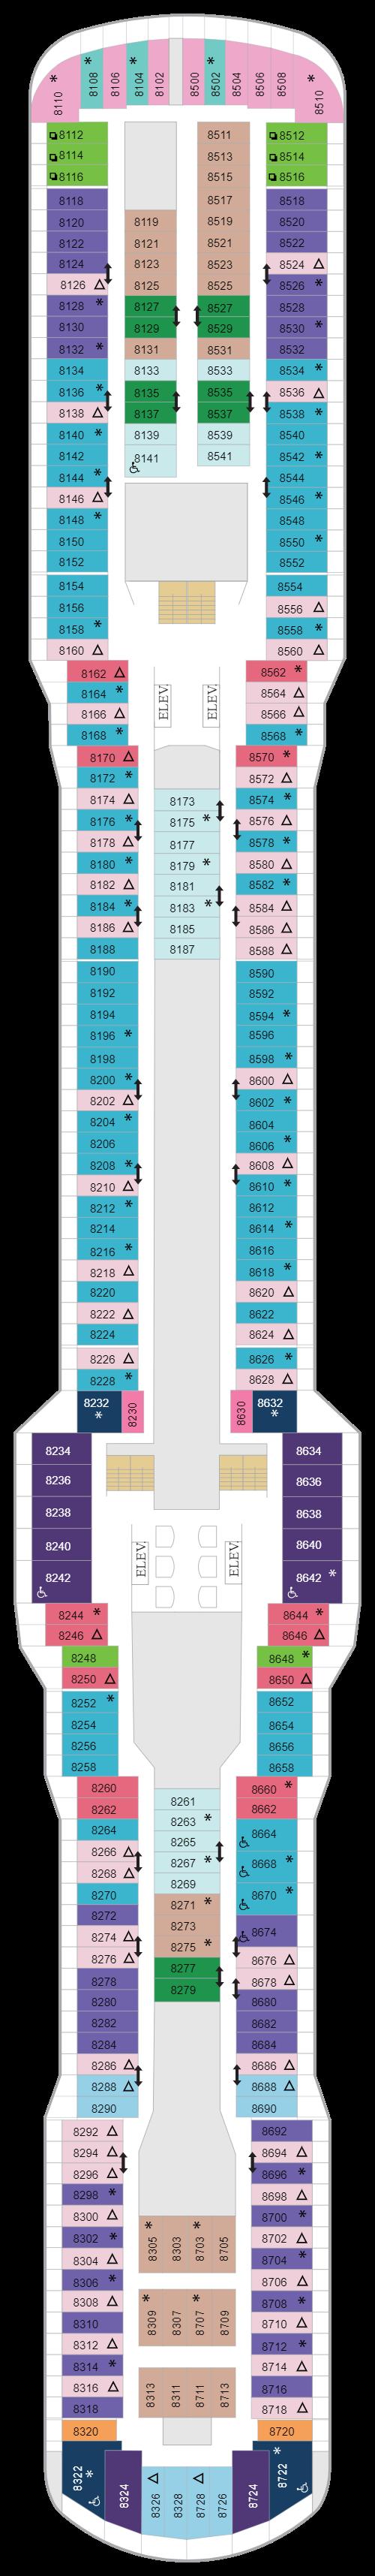 Deck 8 (January 24th, 2021 - Jan12th, 2022)